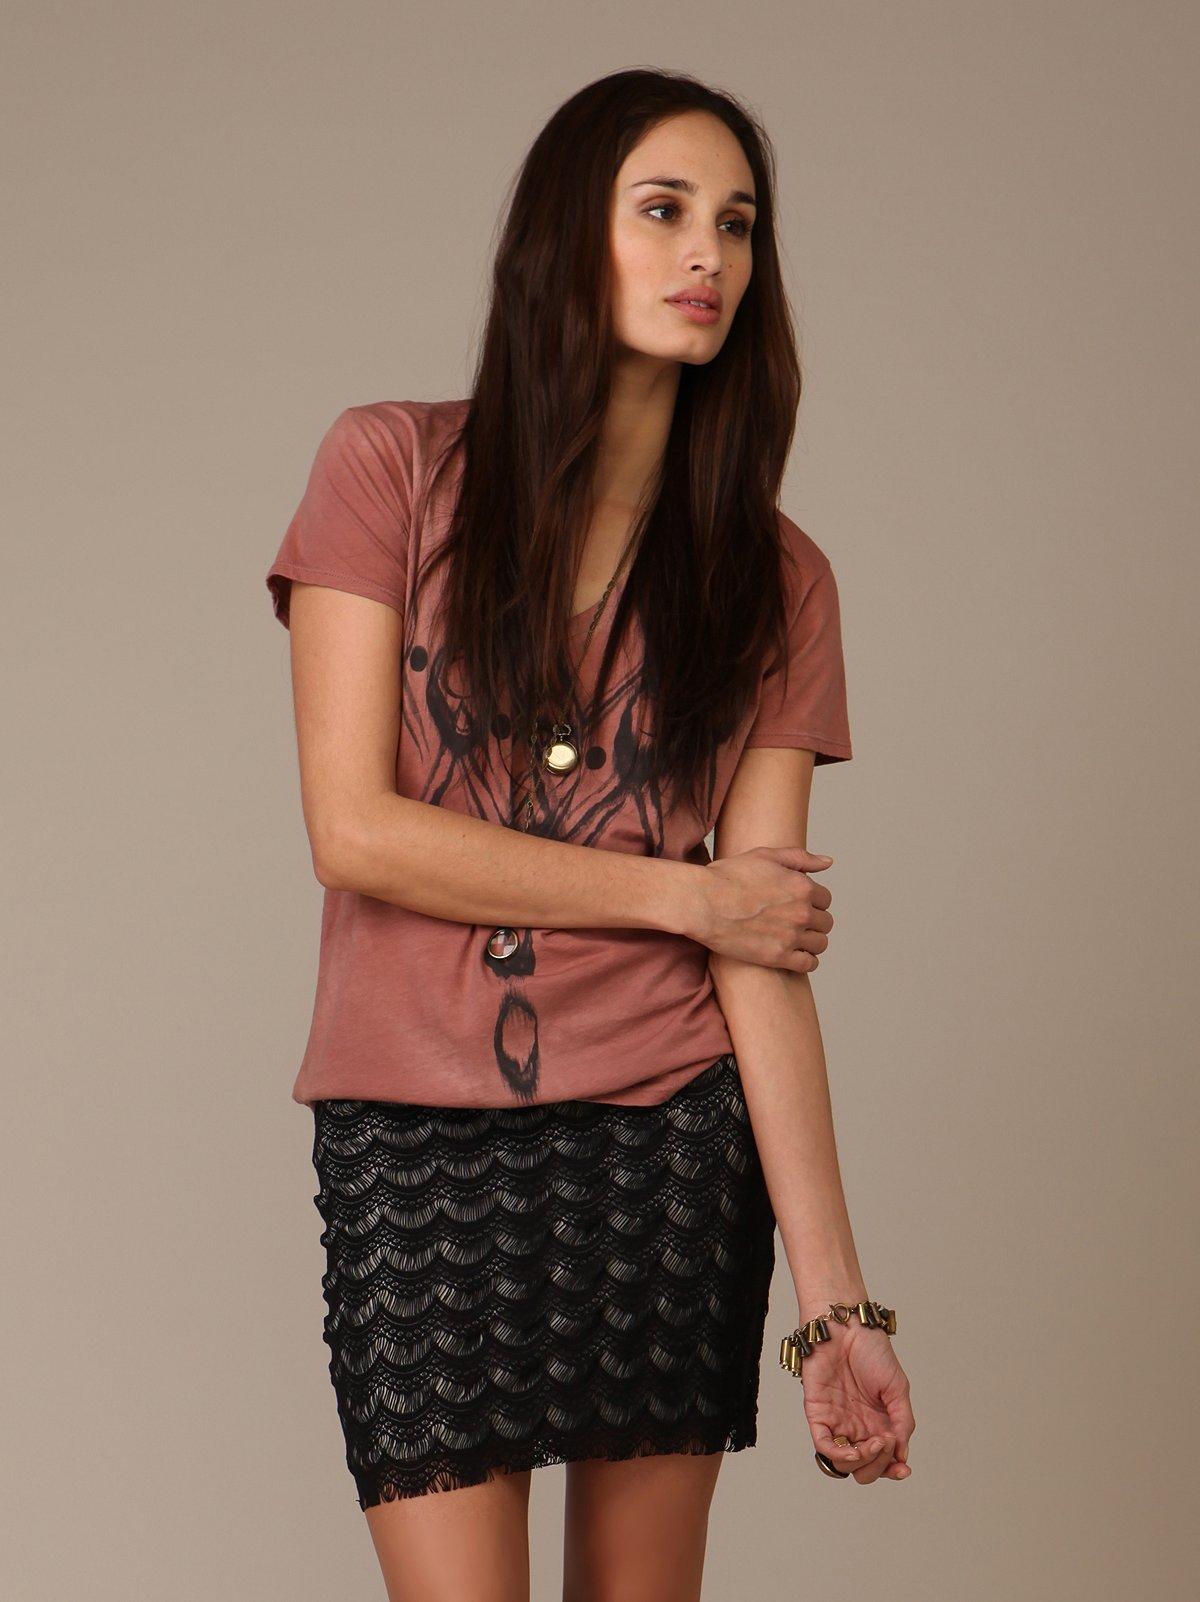 Scalloped Lace Skirt